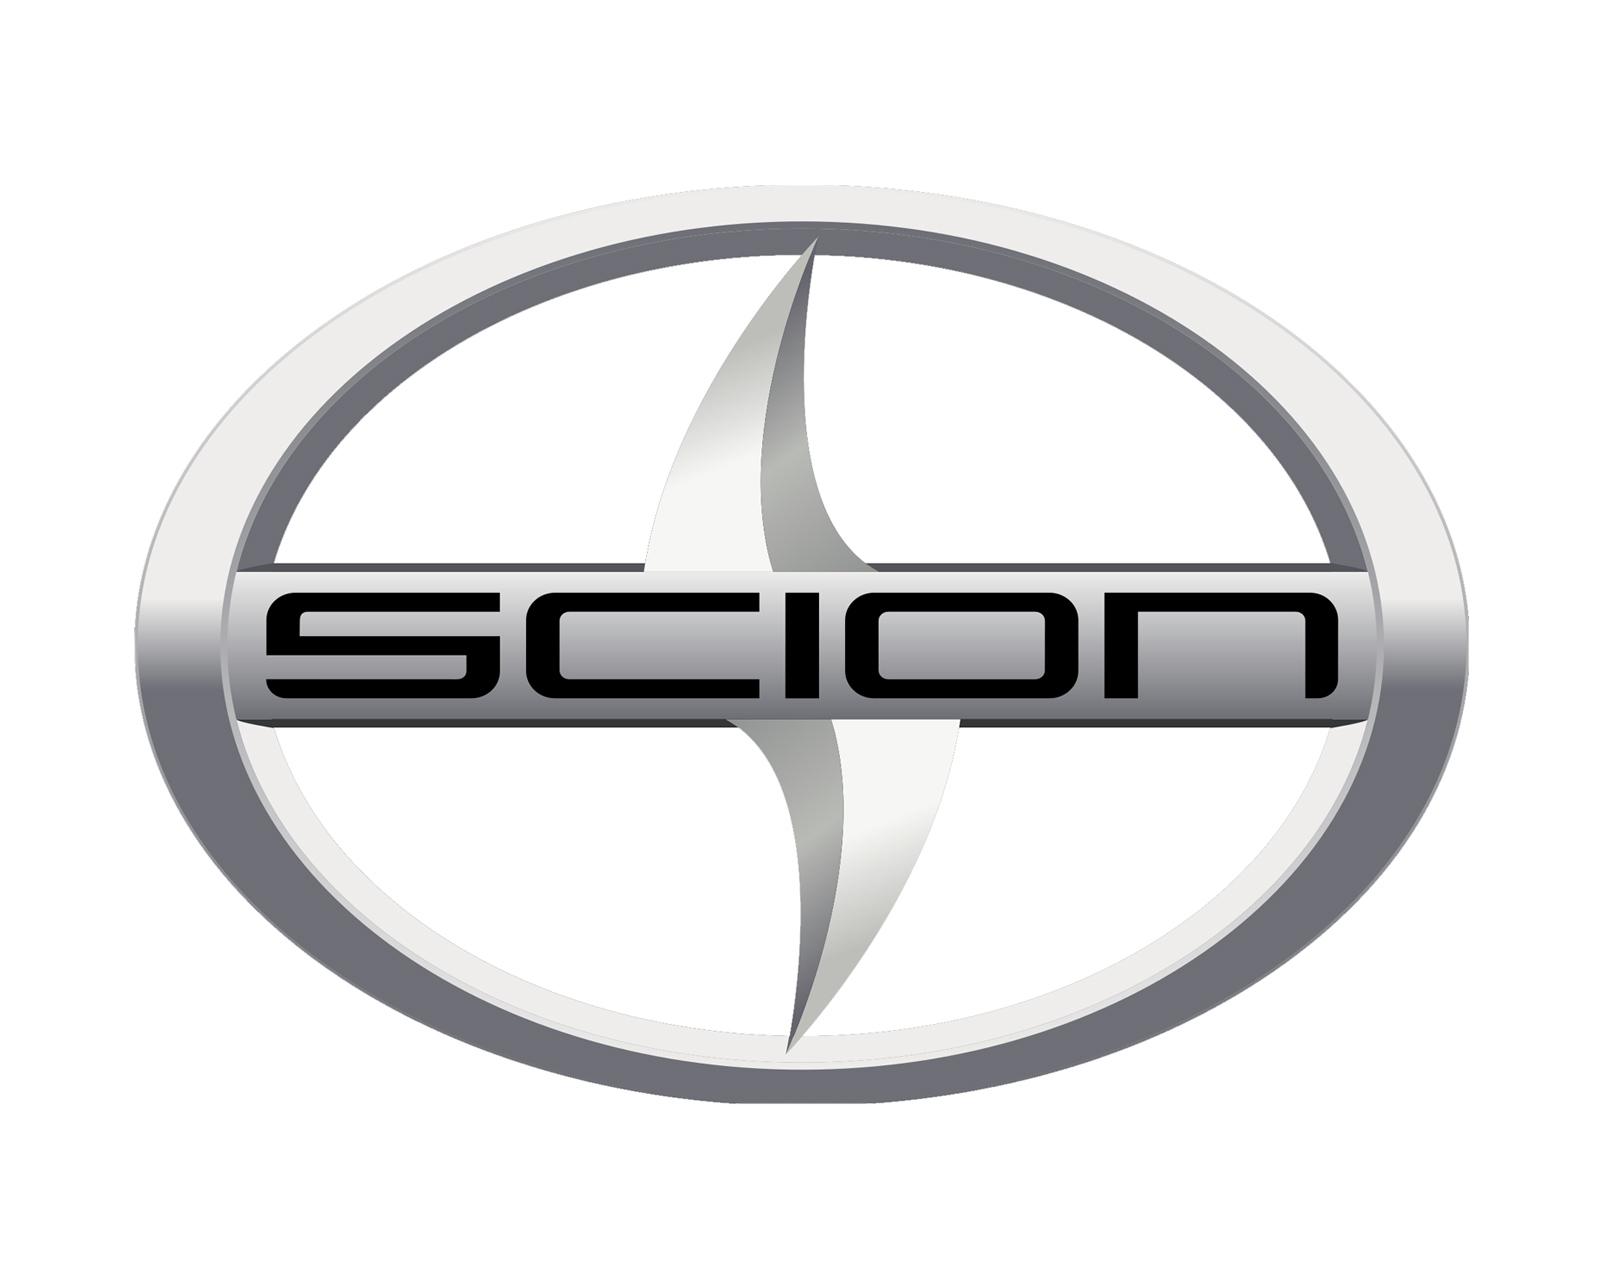 Scion Tc 0-60 >> Large Scion Car Logo - Zero To 60 Times